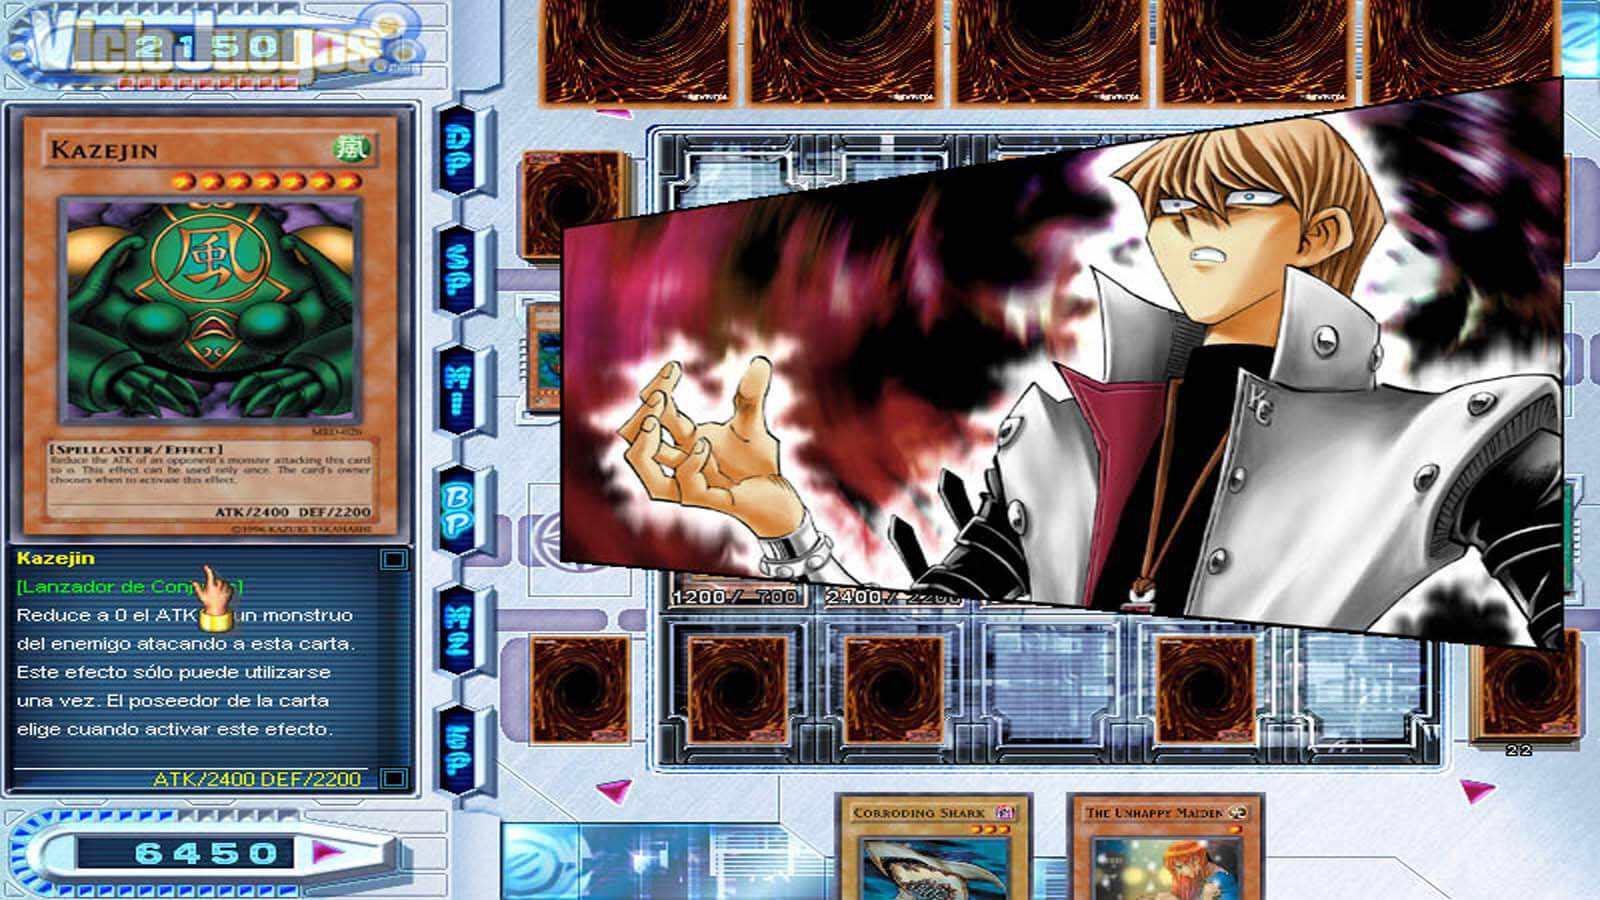 تحميل لعبة Power Of Chaos Kaiba The Revenge مضغوطة برابط واحد مباشر كاملة مجانا